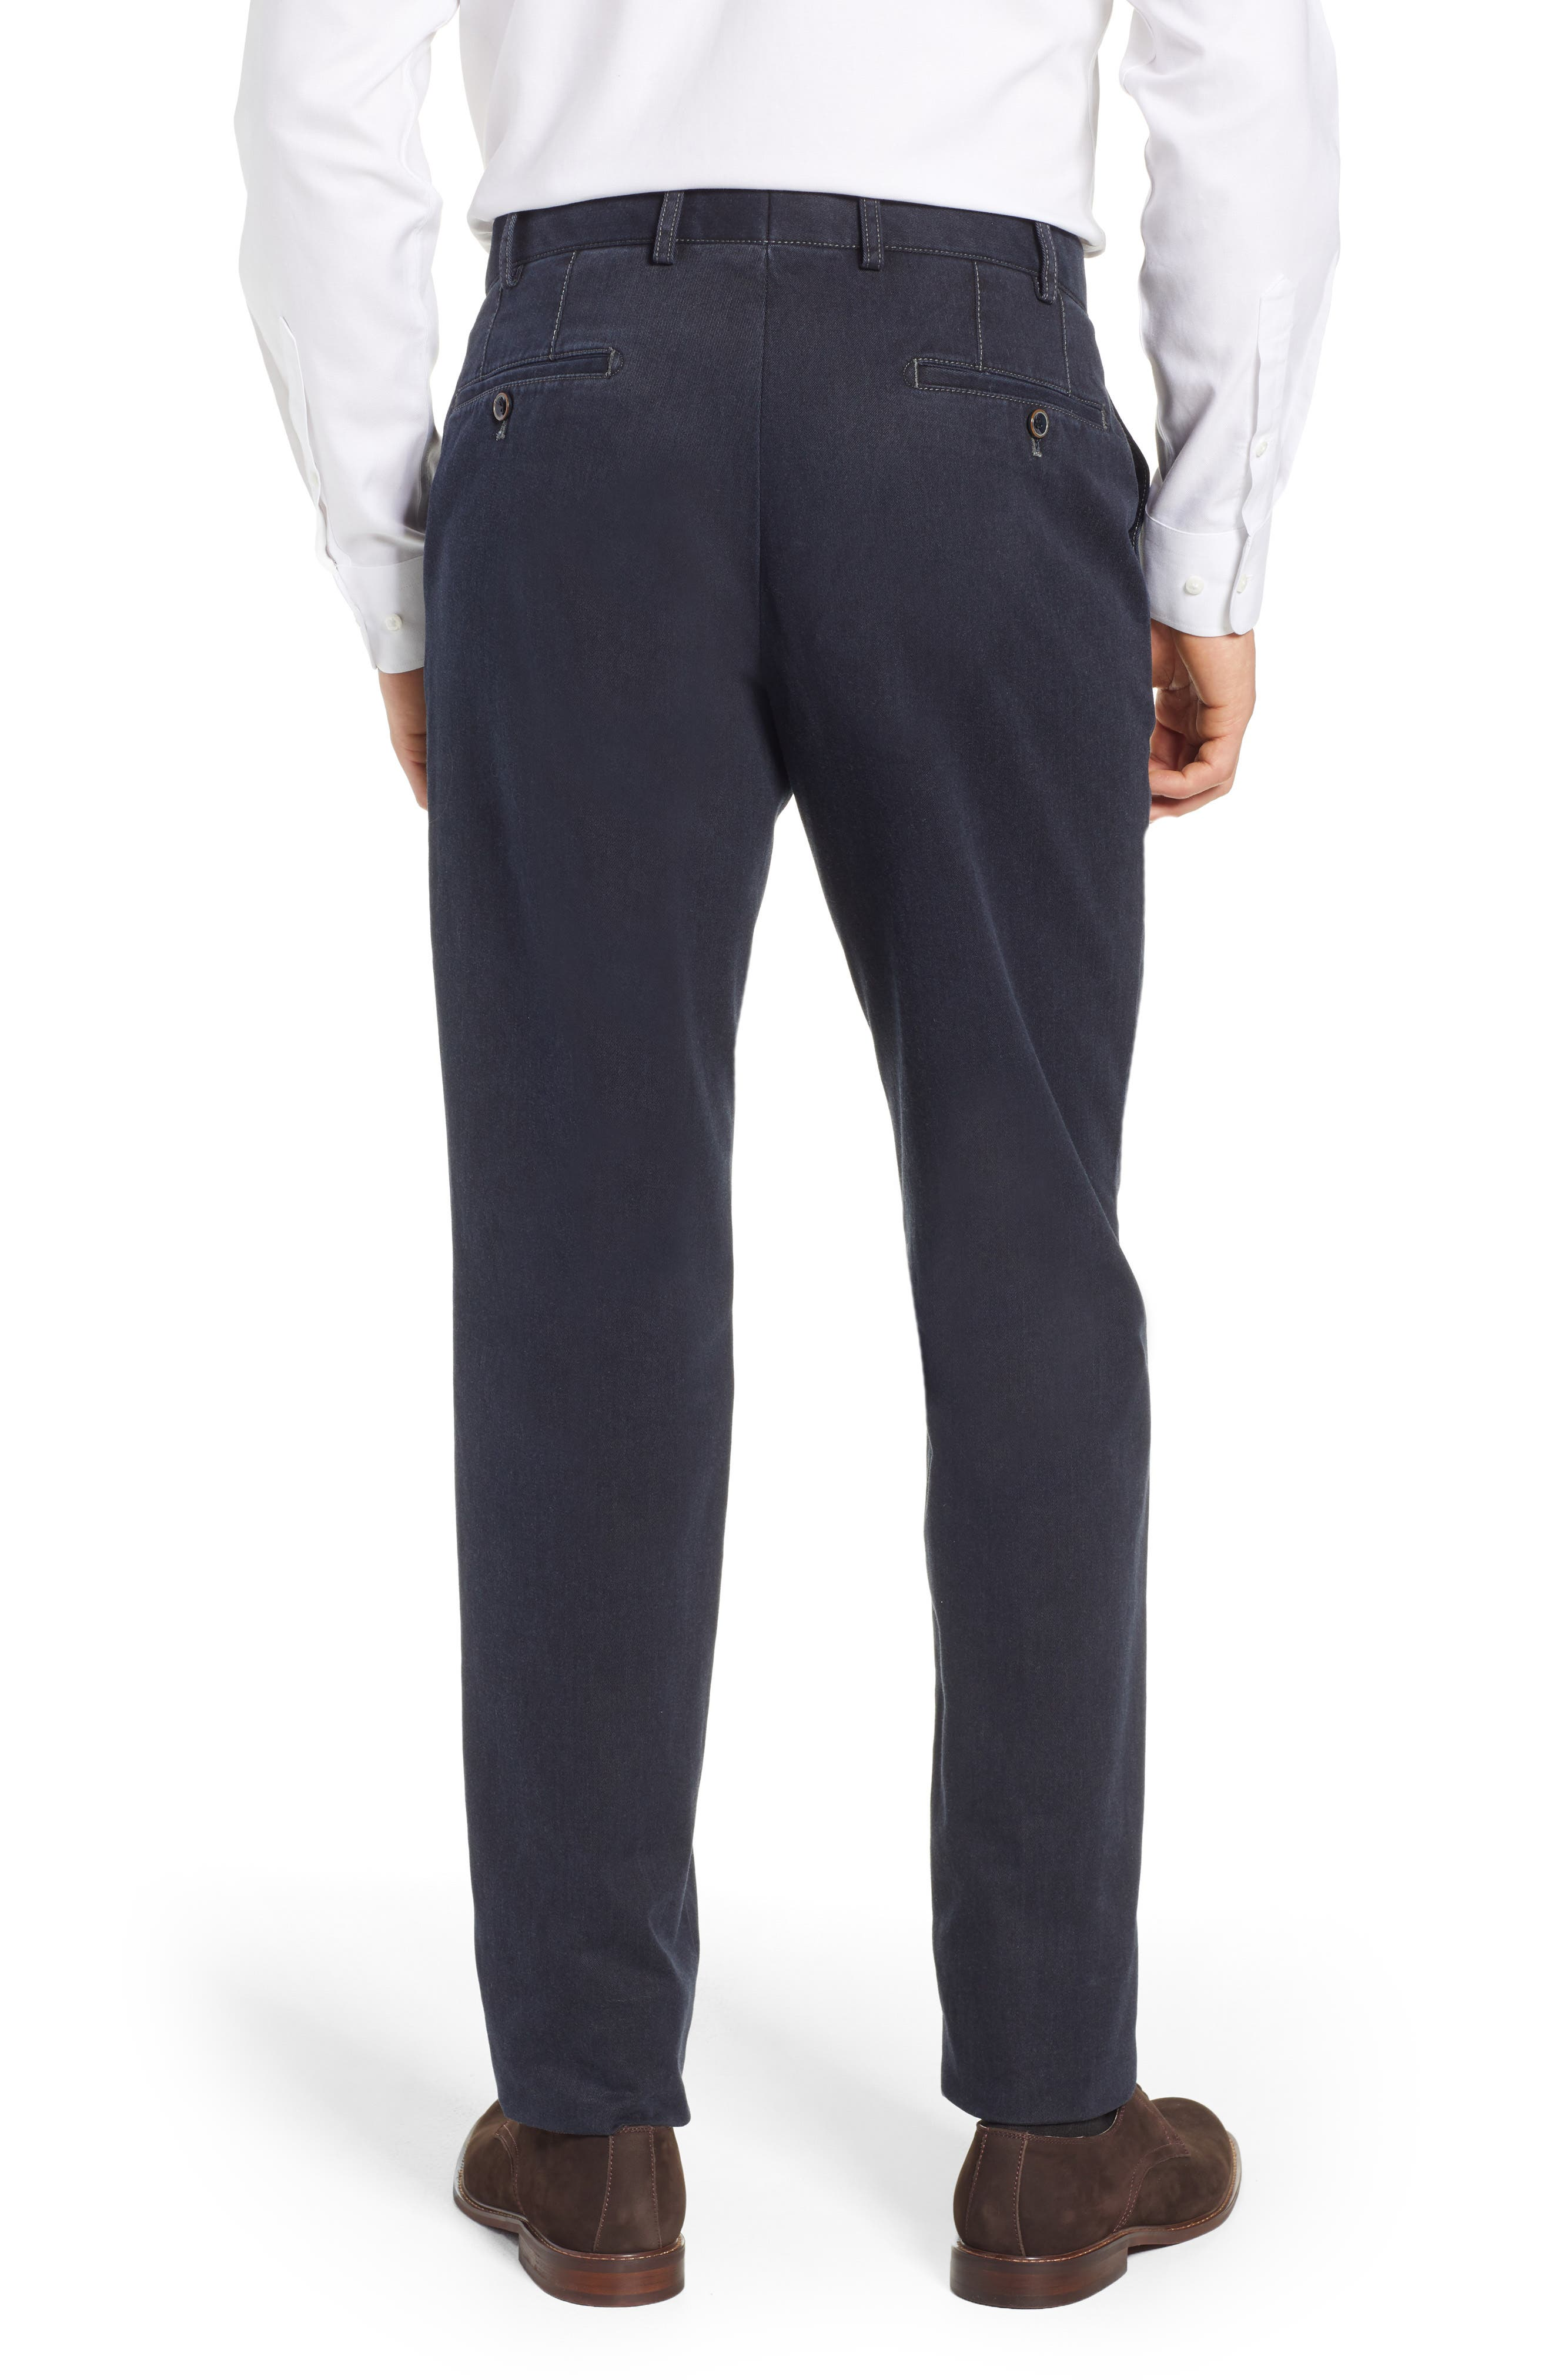 Pero Trim Fit Stretch Flat Front Cotton Blend Trousers,                             Alternate thumbnail 2, color,                             CHARCOAL